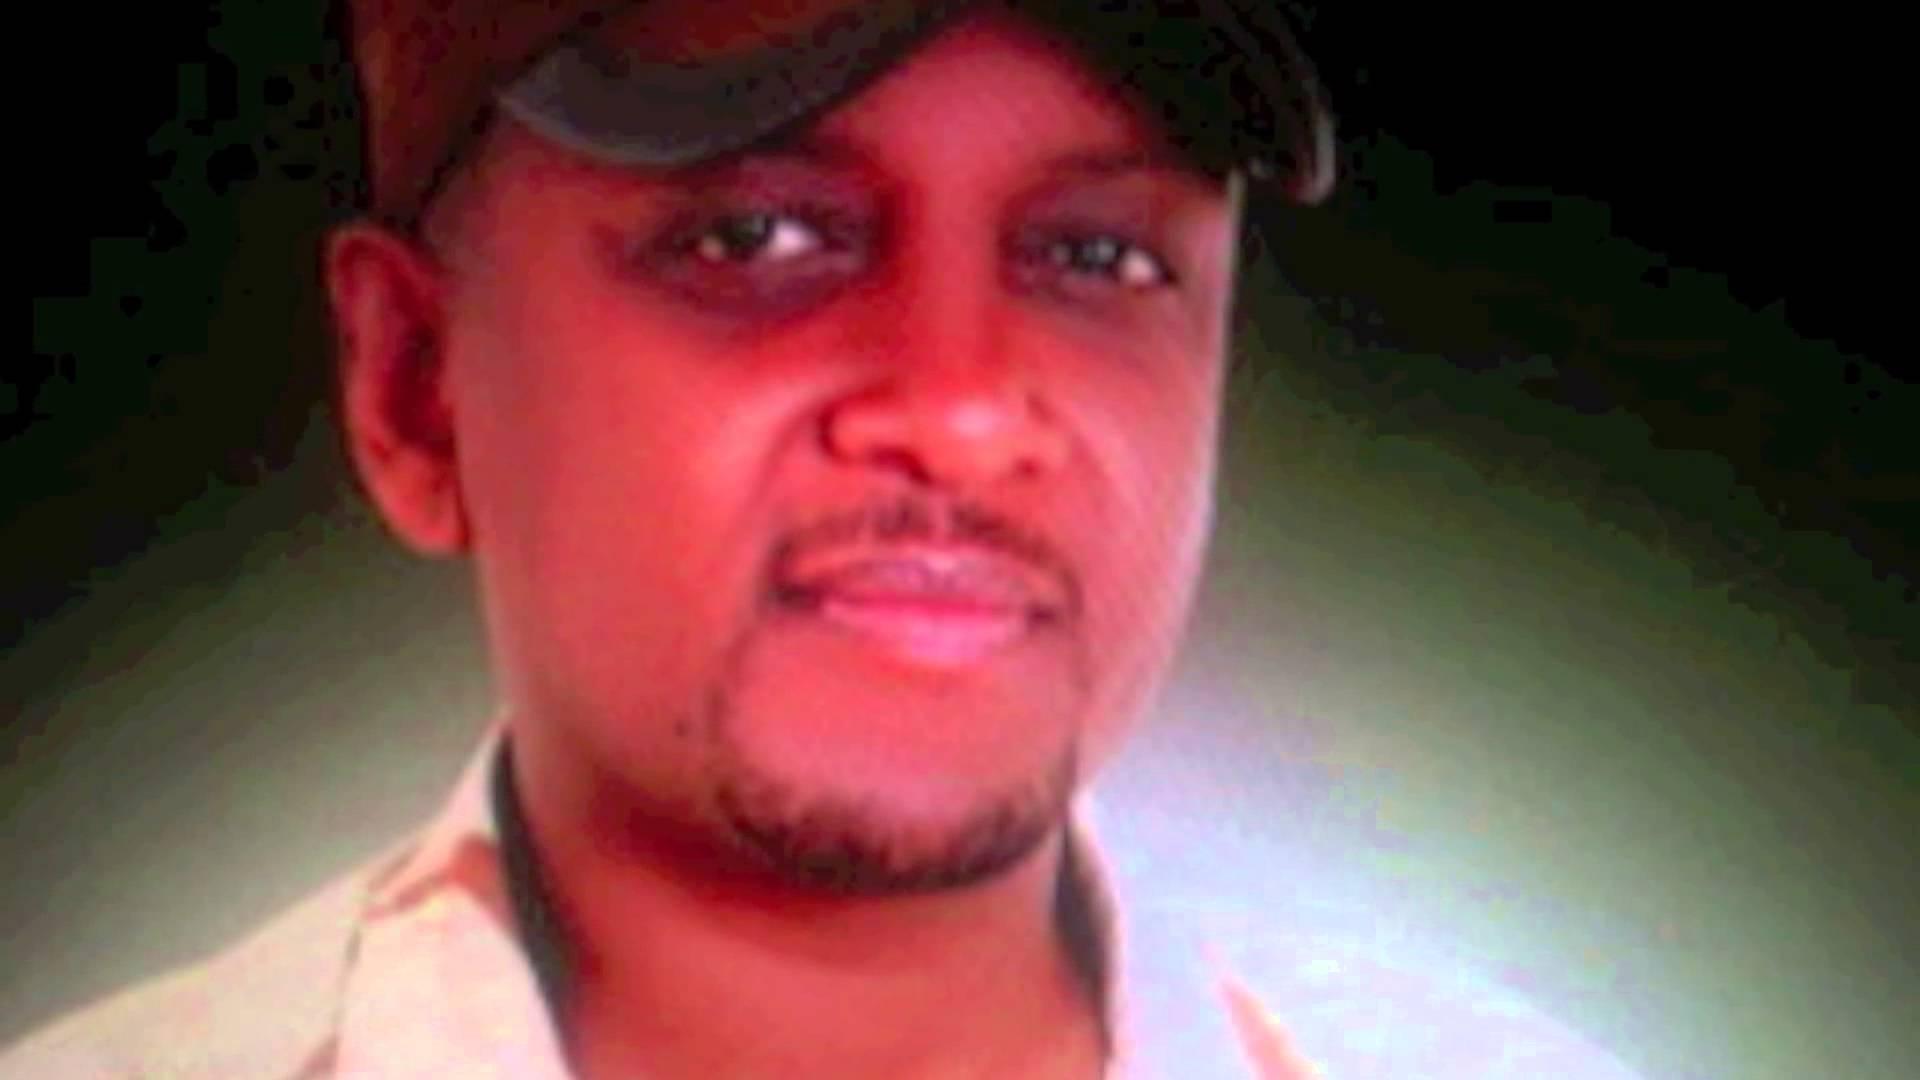 uzabatashye par Masamba Intore «rwandaises.com»